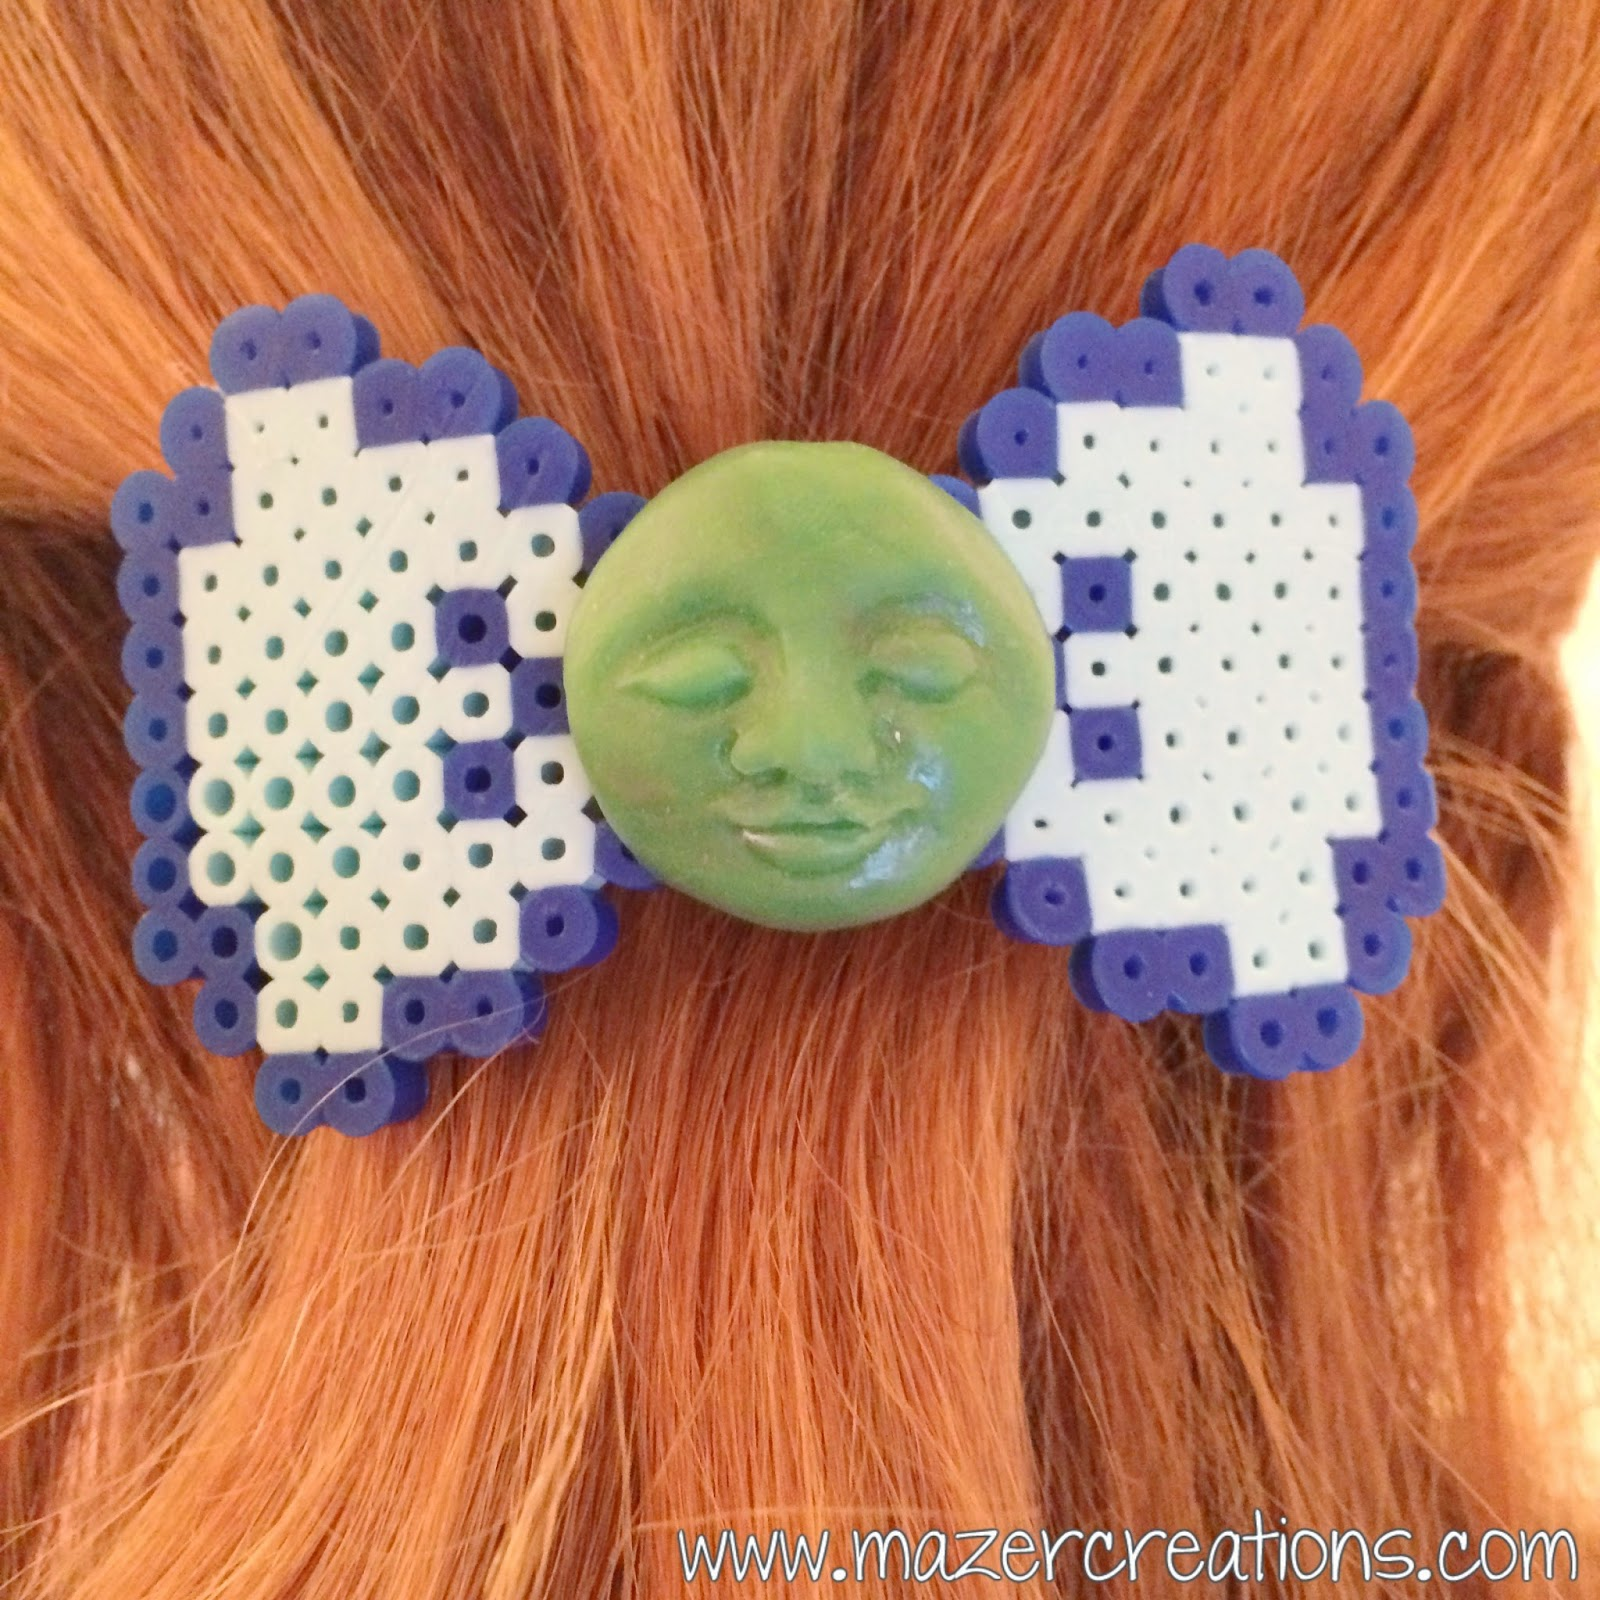 How To Make A Perler Bead Bow Hair Clip | Mazer Creations